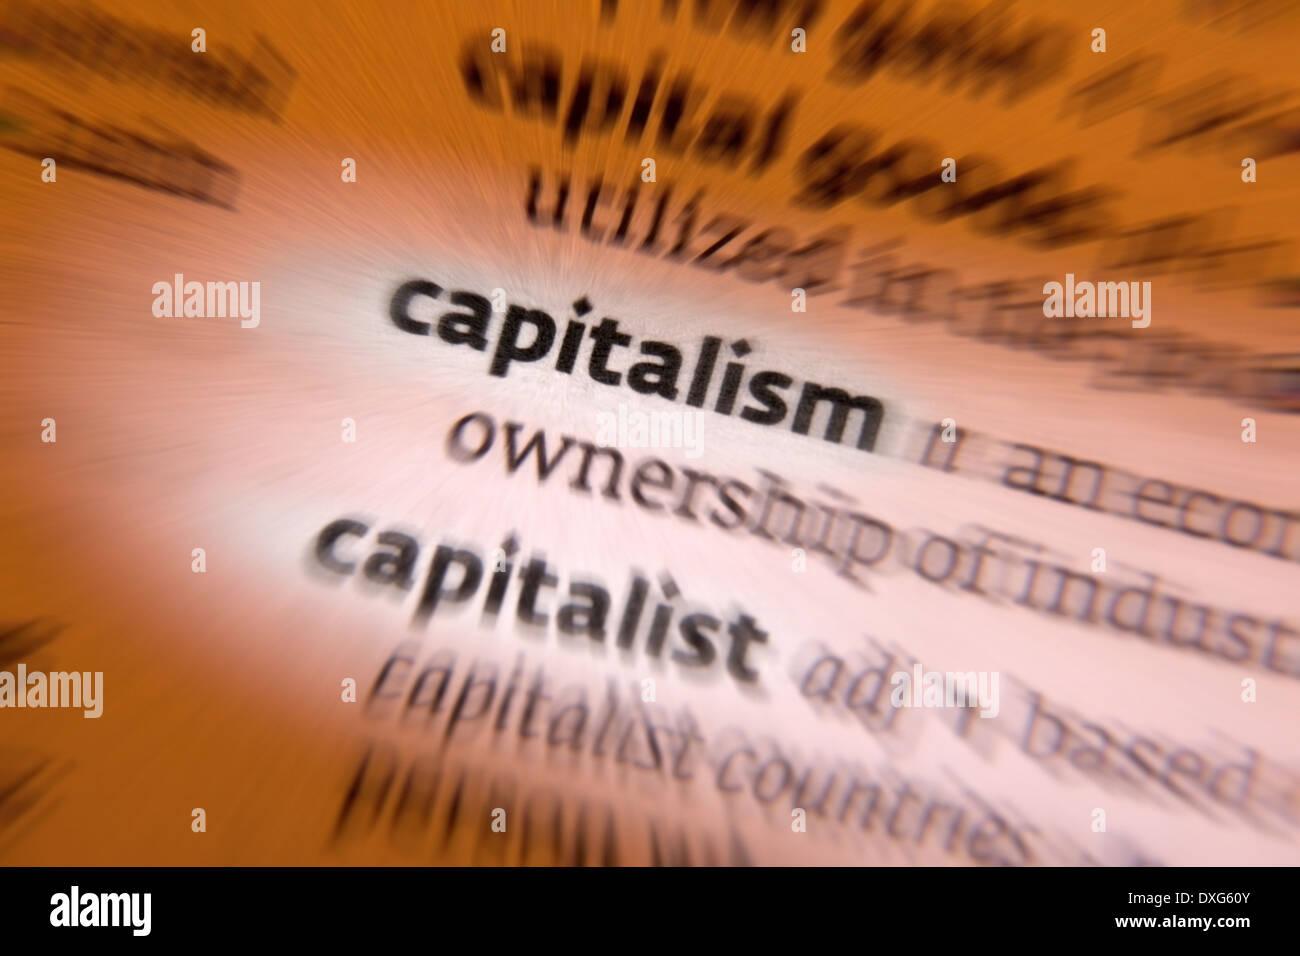 Capitalism - Stock Image